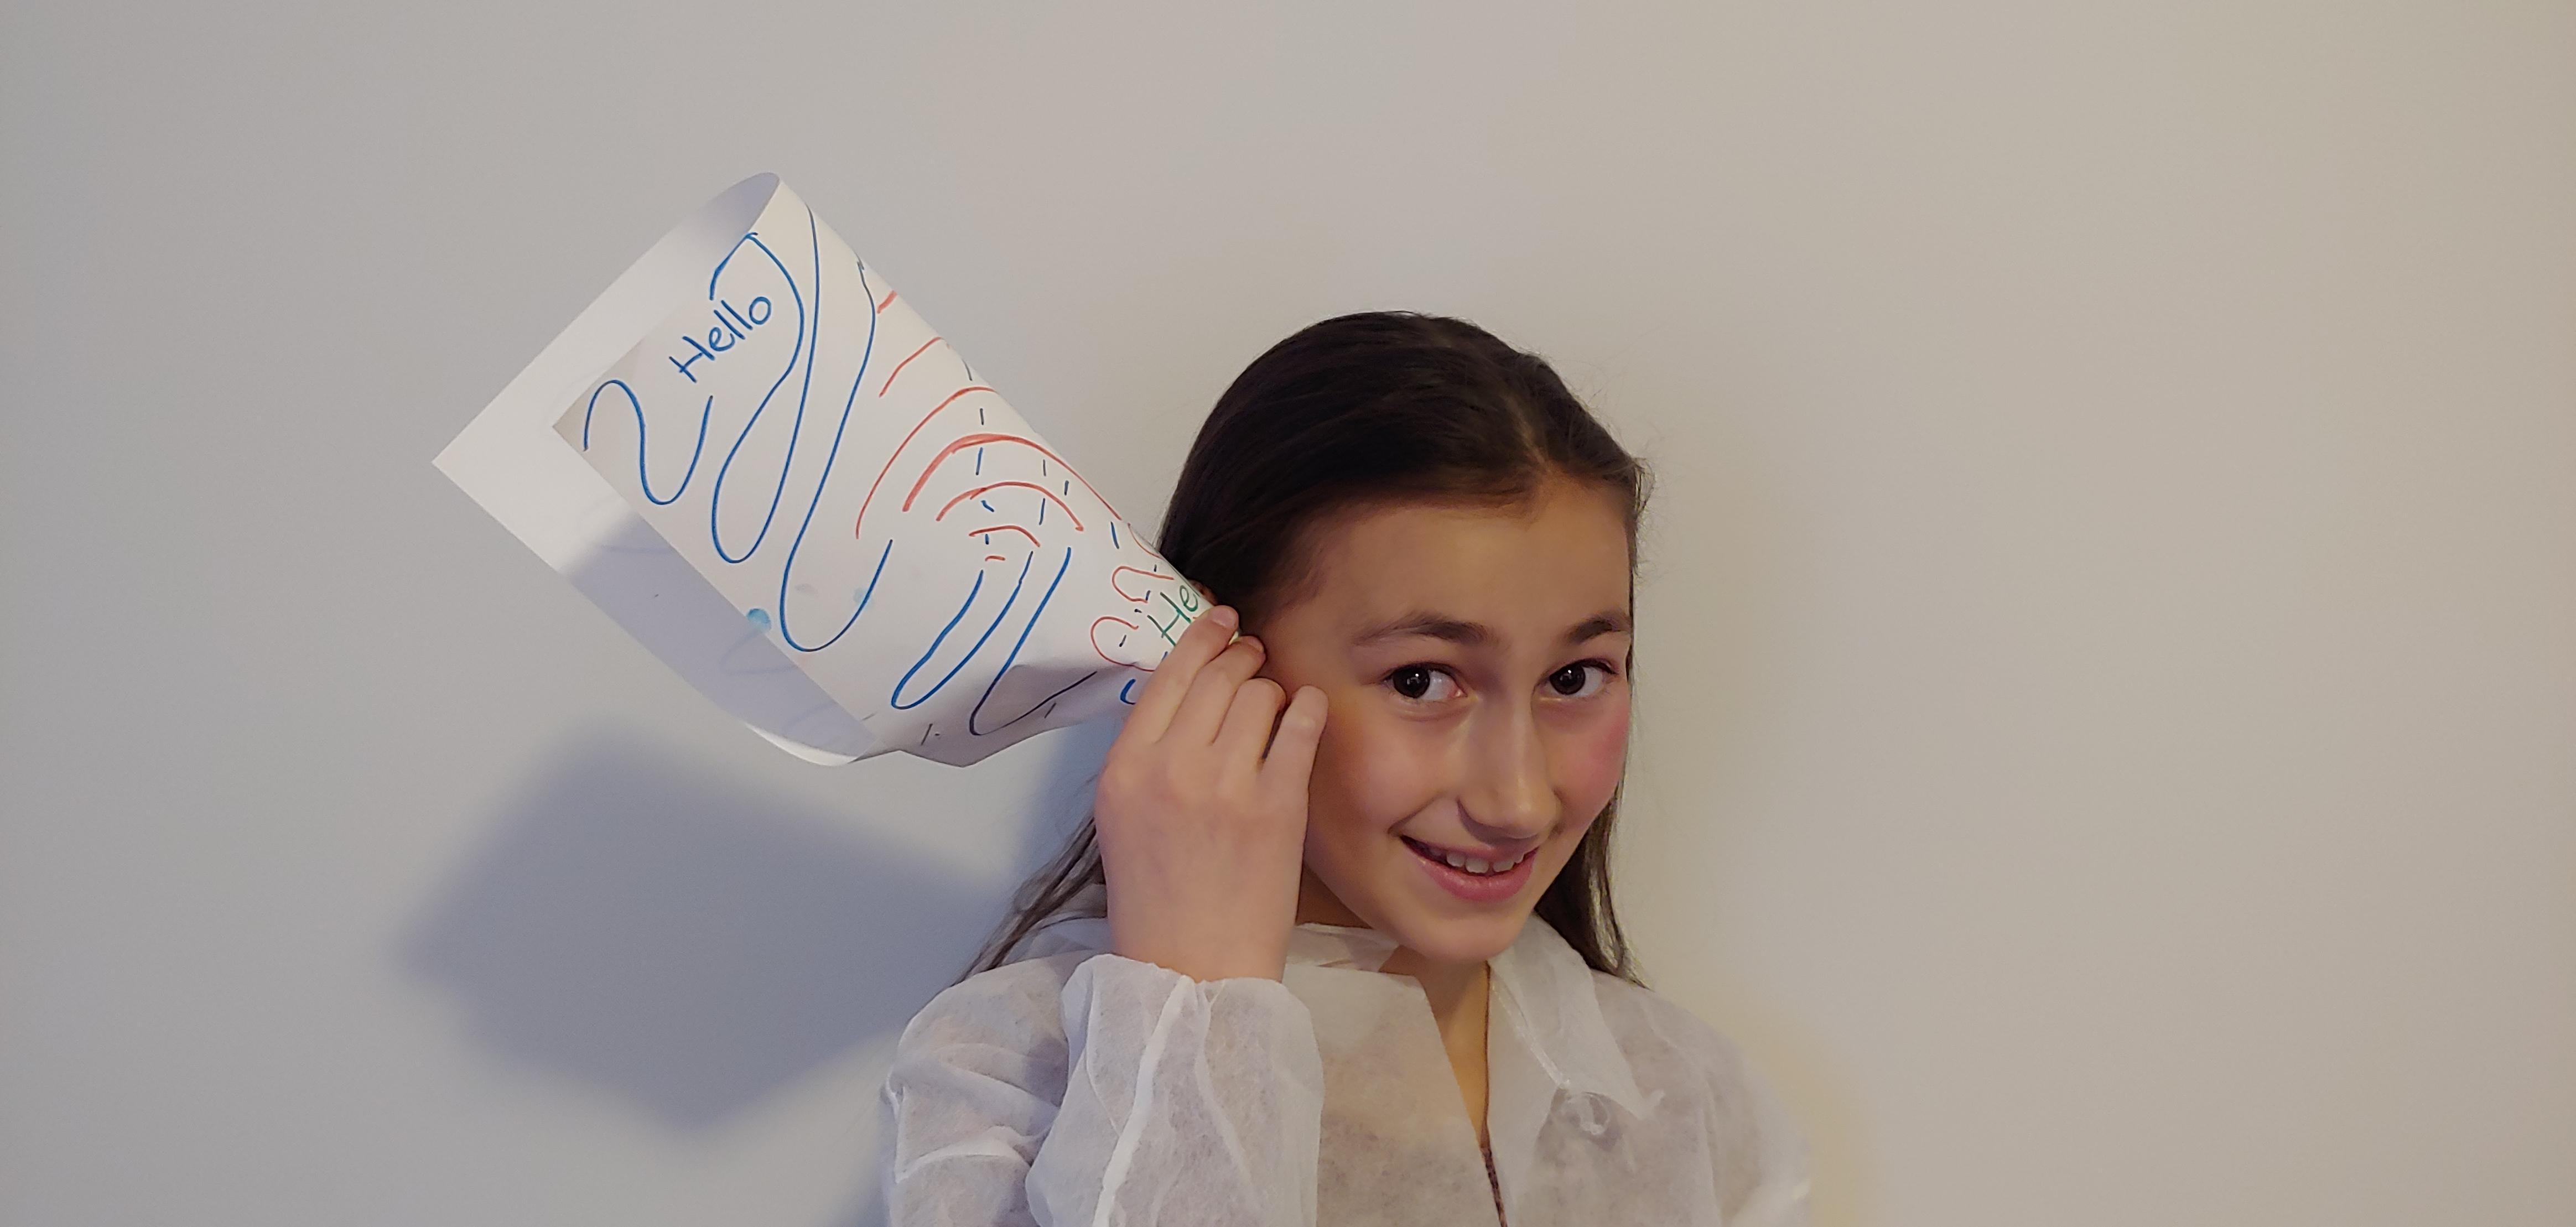 LITTLE DOCTOR SCHOOL: Eye, Ears, CPR & More! (5-10 Years Old)